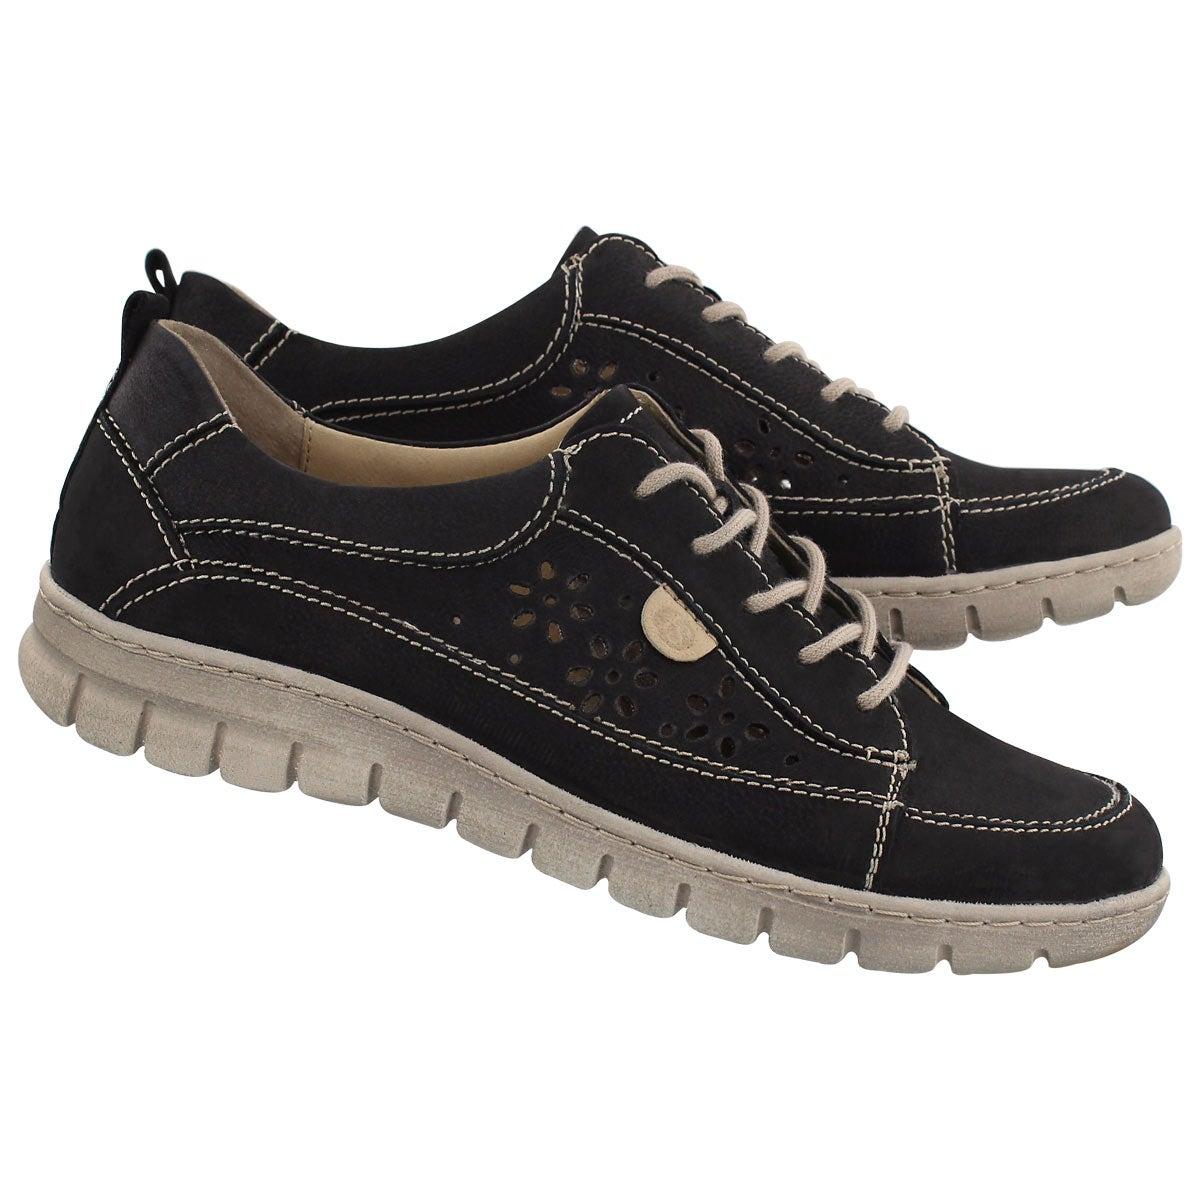 Lds Steffi 23 black lace up sneaker